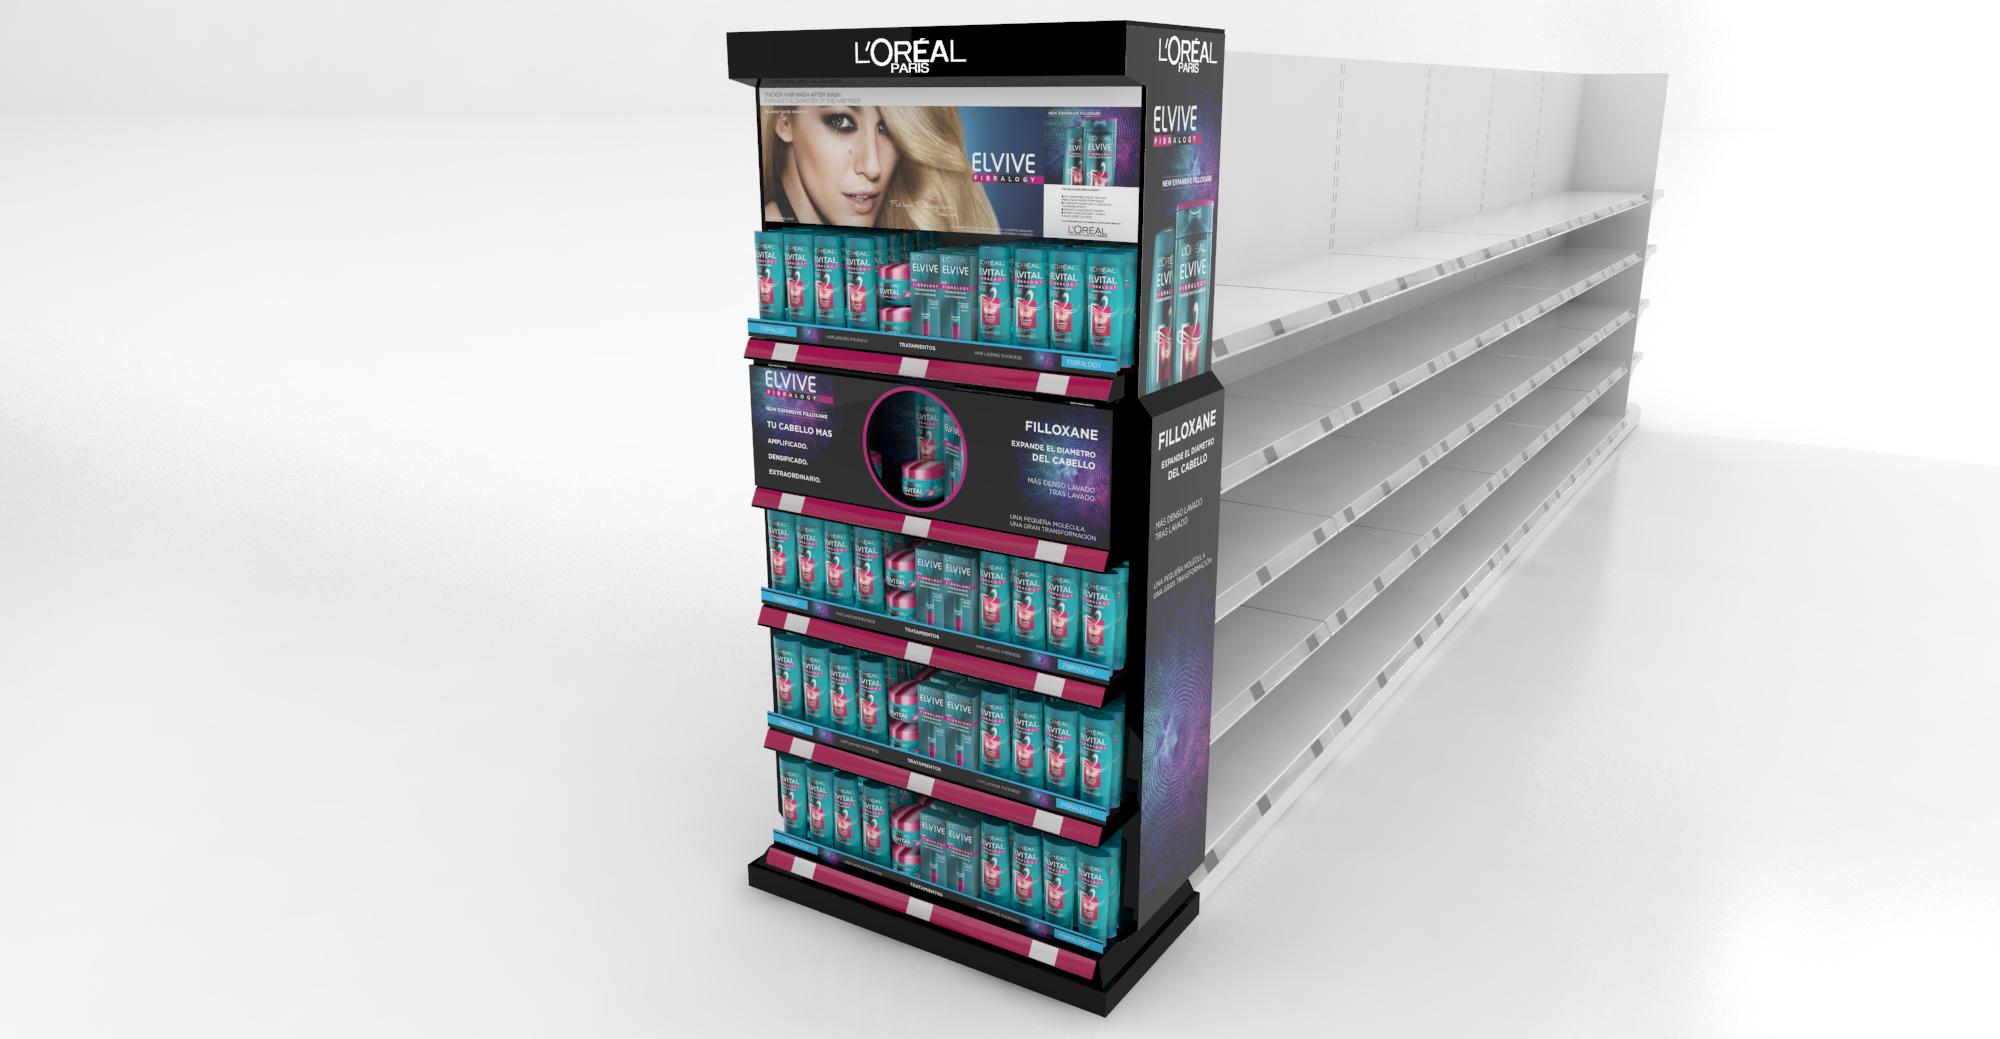 Diseño hecho en la empresa Granja digital Ltda